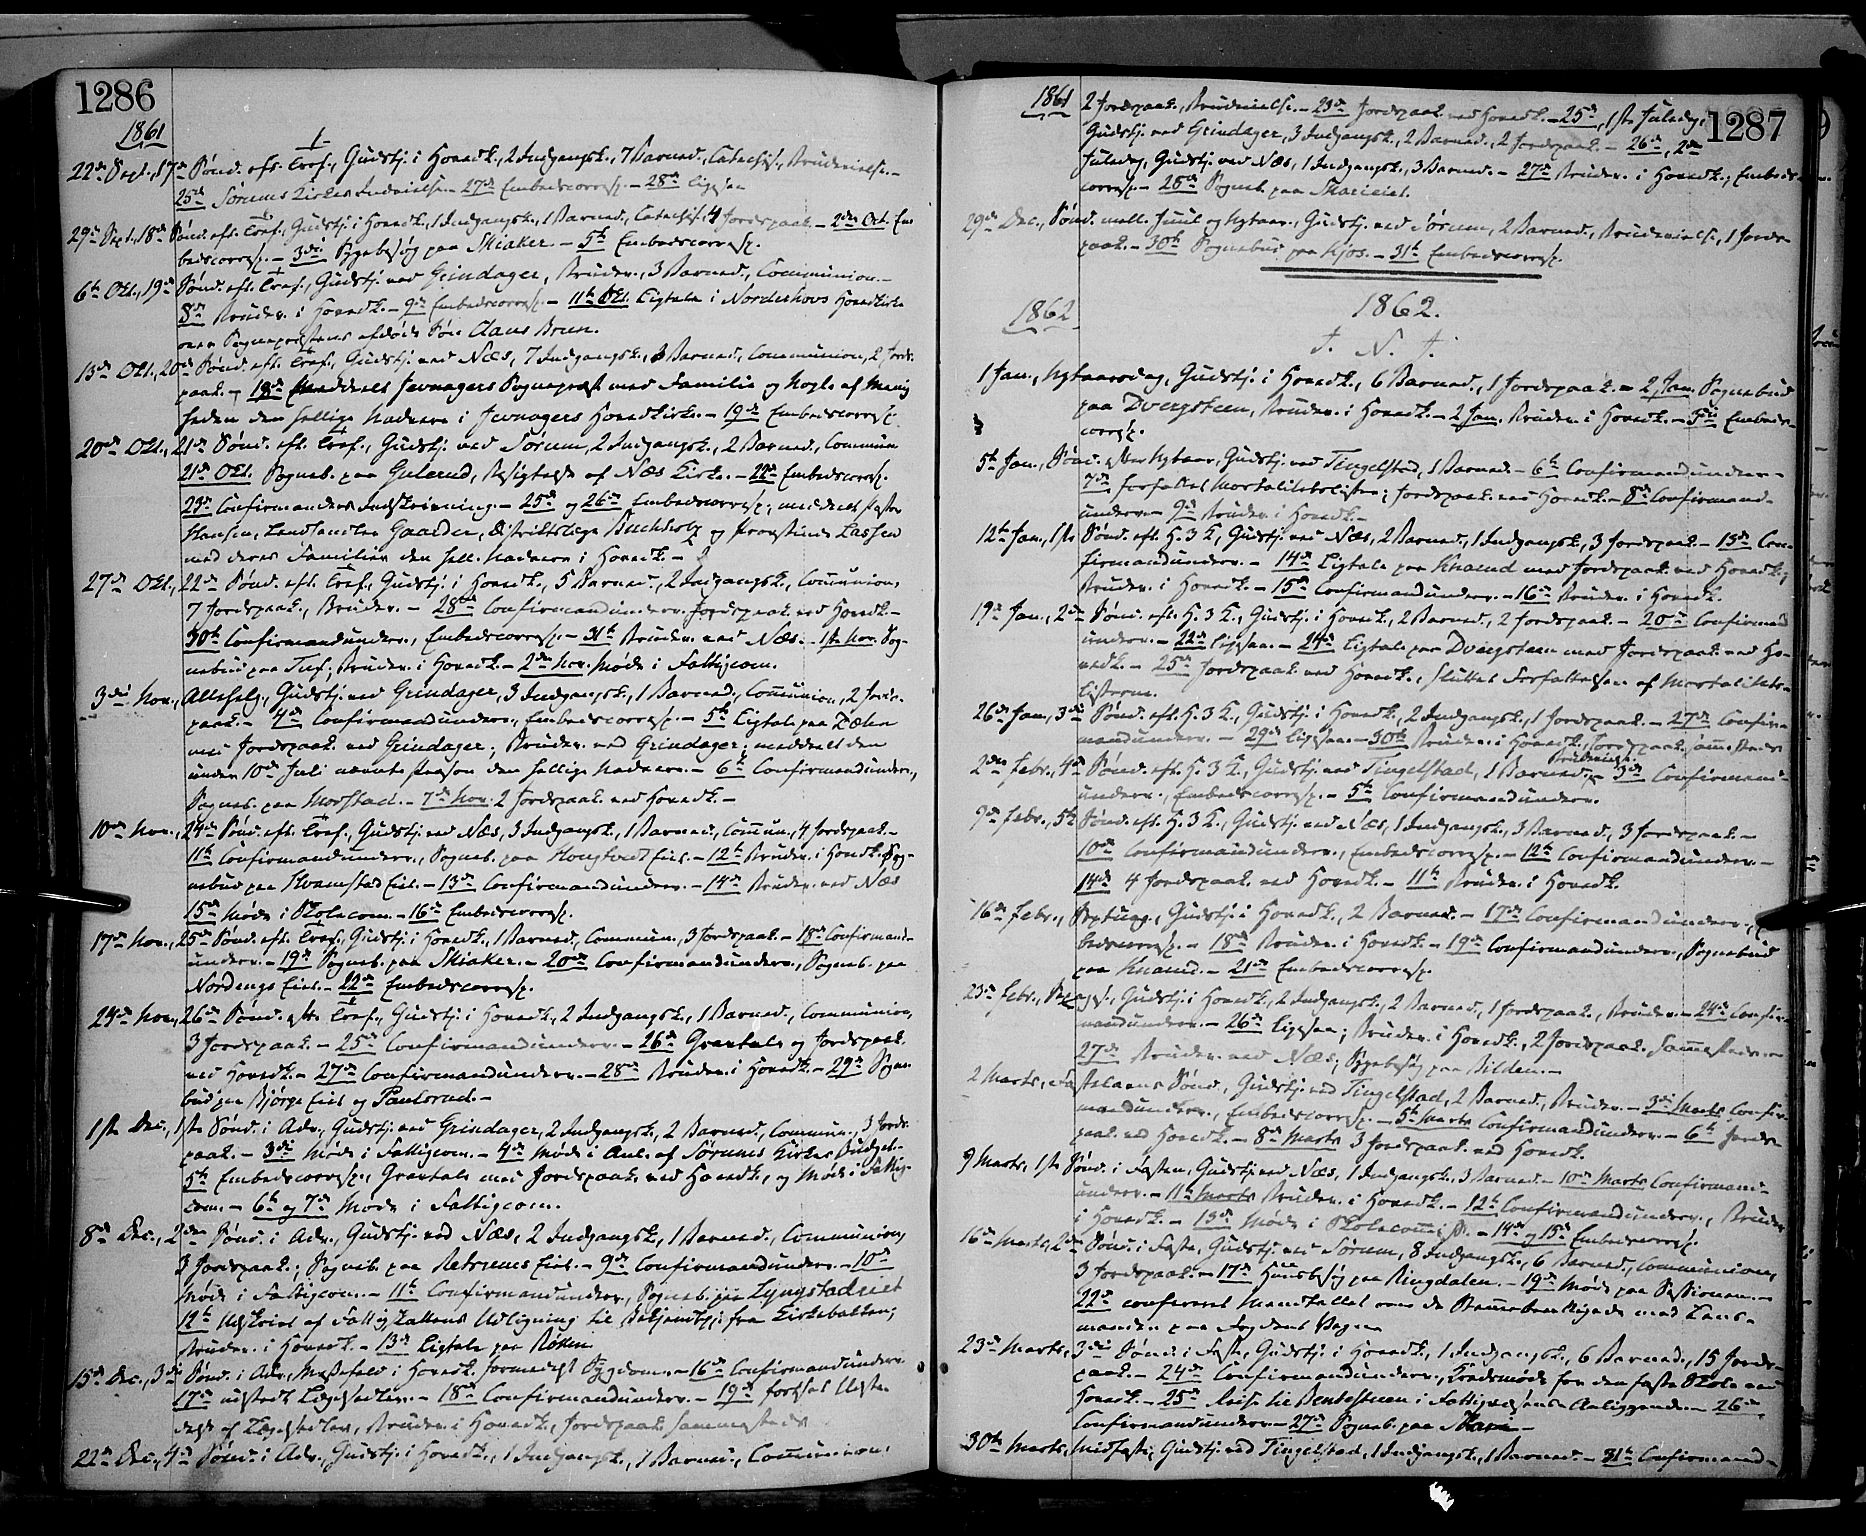 SAH, Gran prestekontor, Ministerialbok nr. 12, 1856-1874, s. 1286-1287